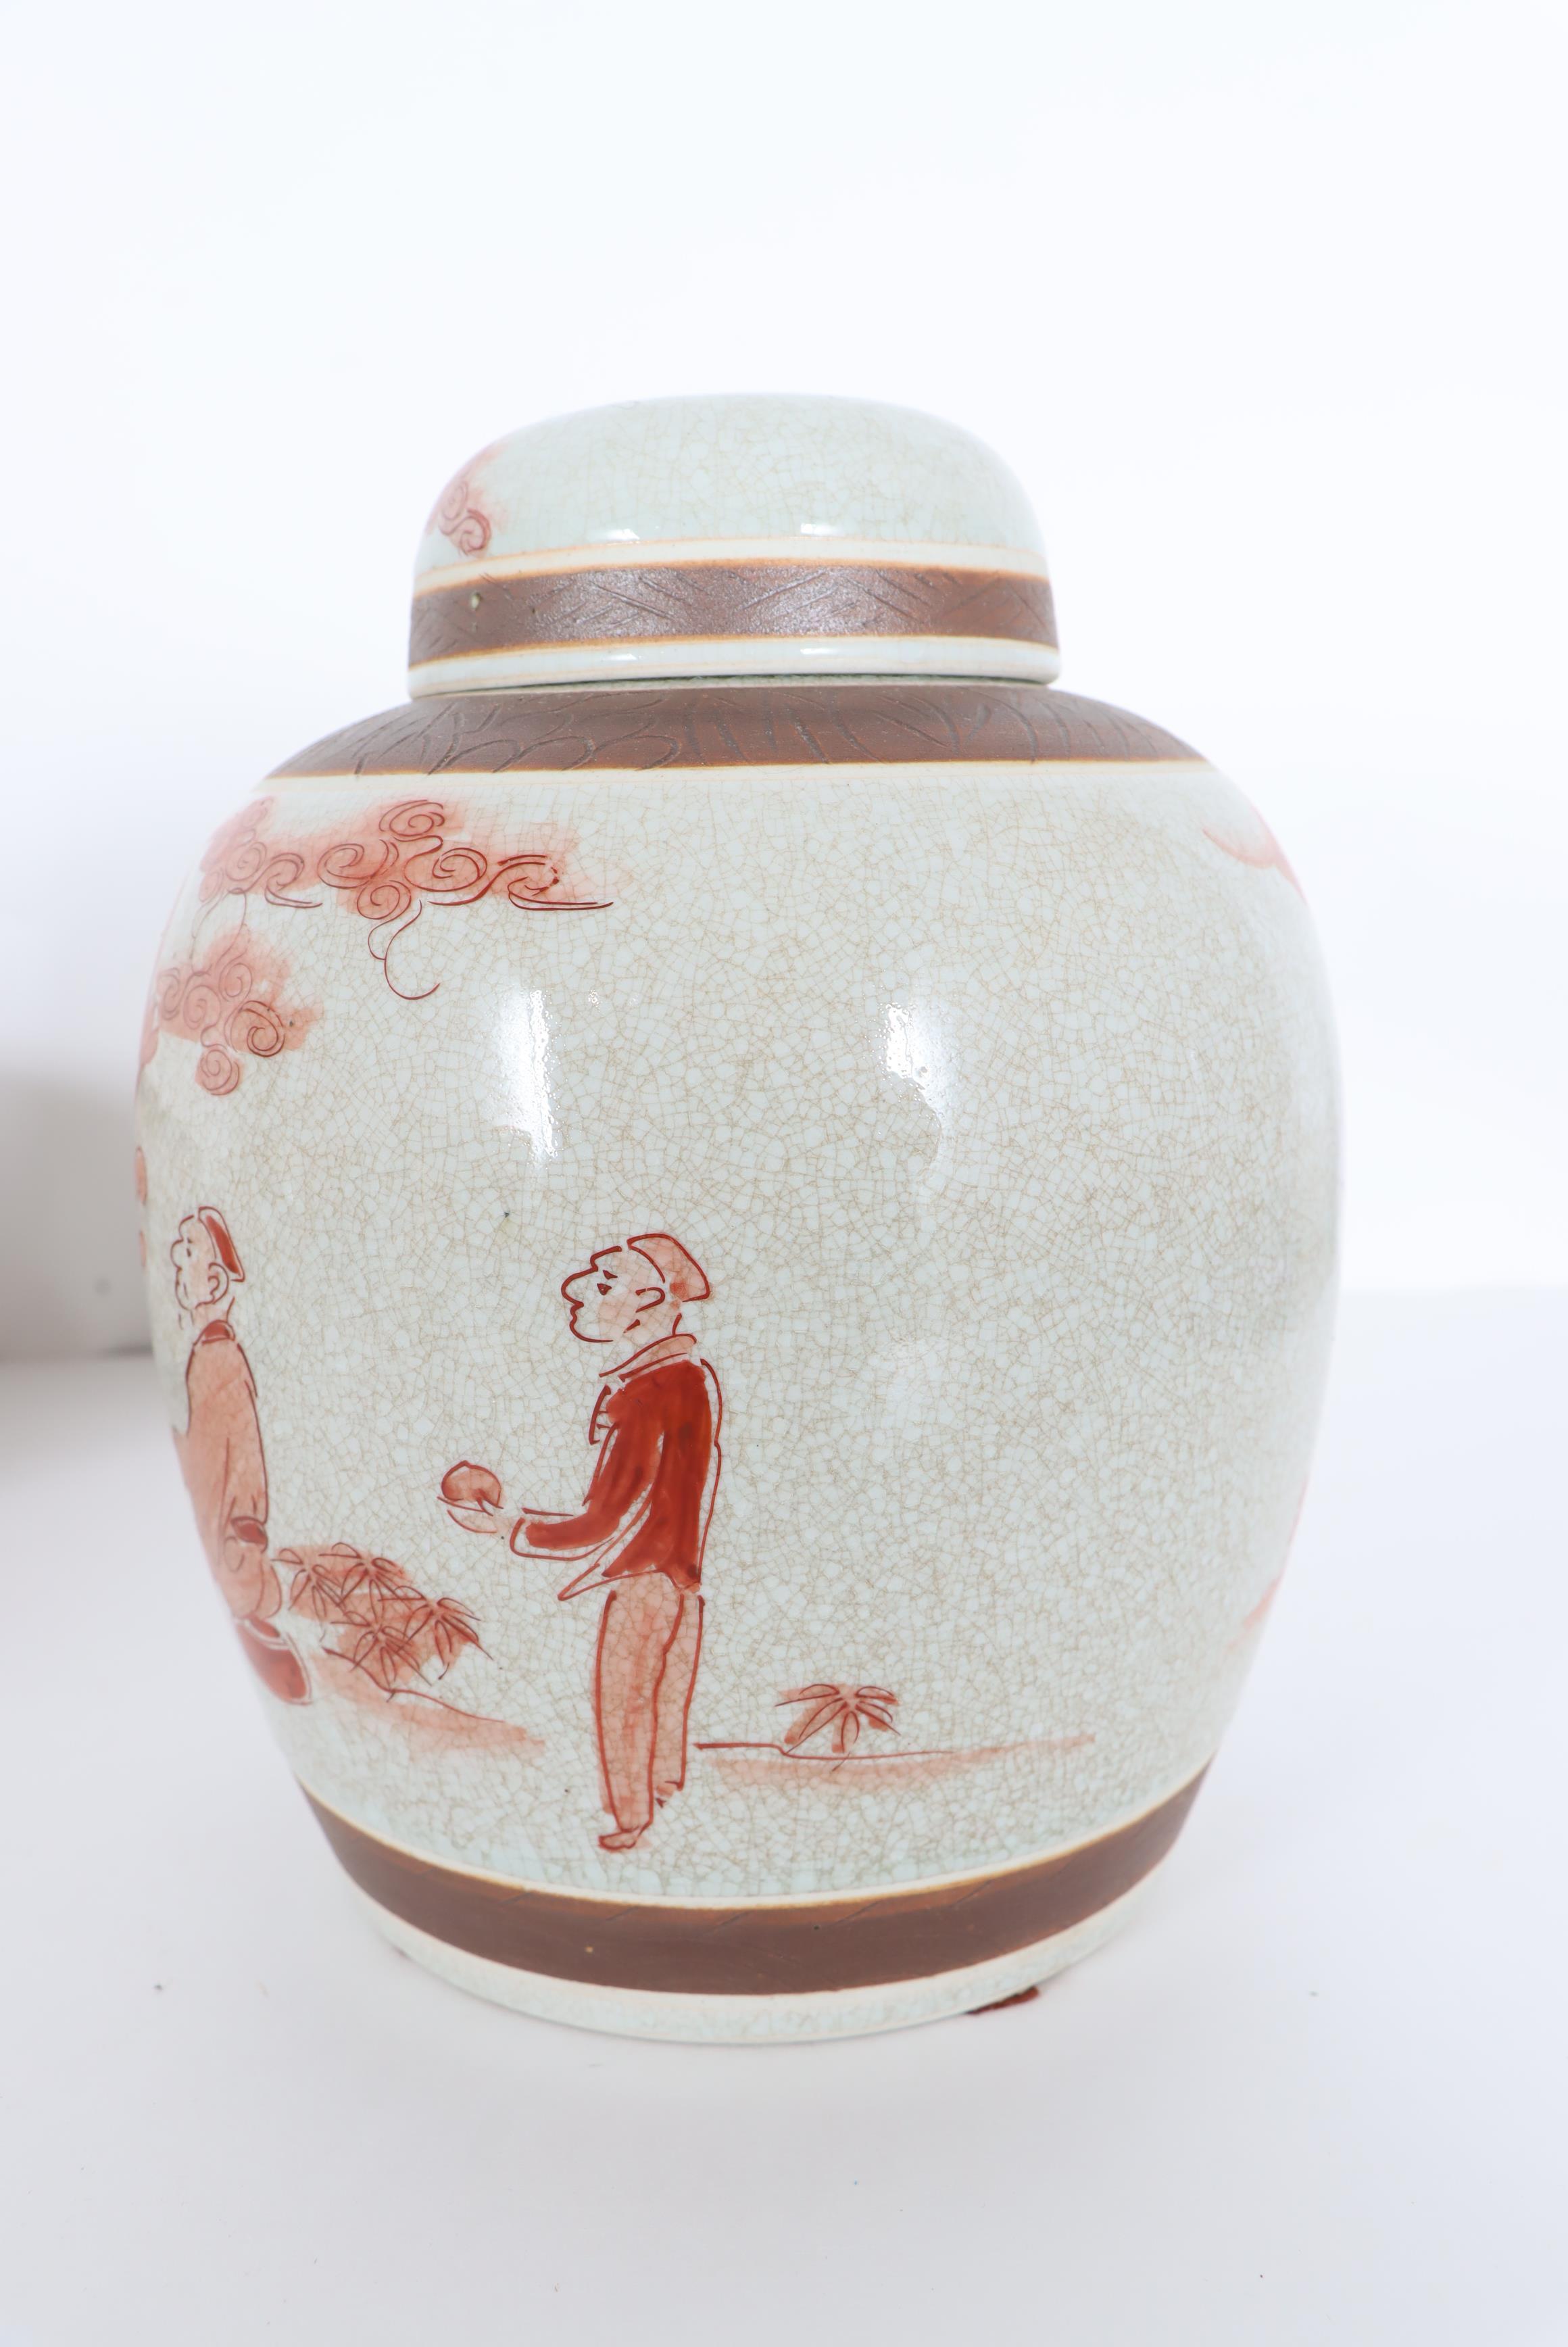 Chinese Porcelain Bowl & Ginger Jar w Lid - Image 8 of 16